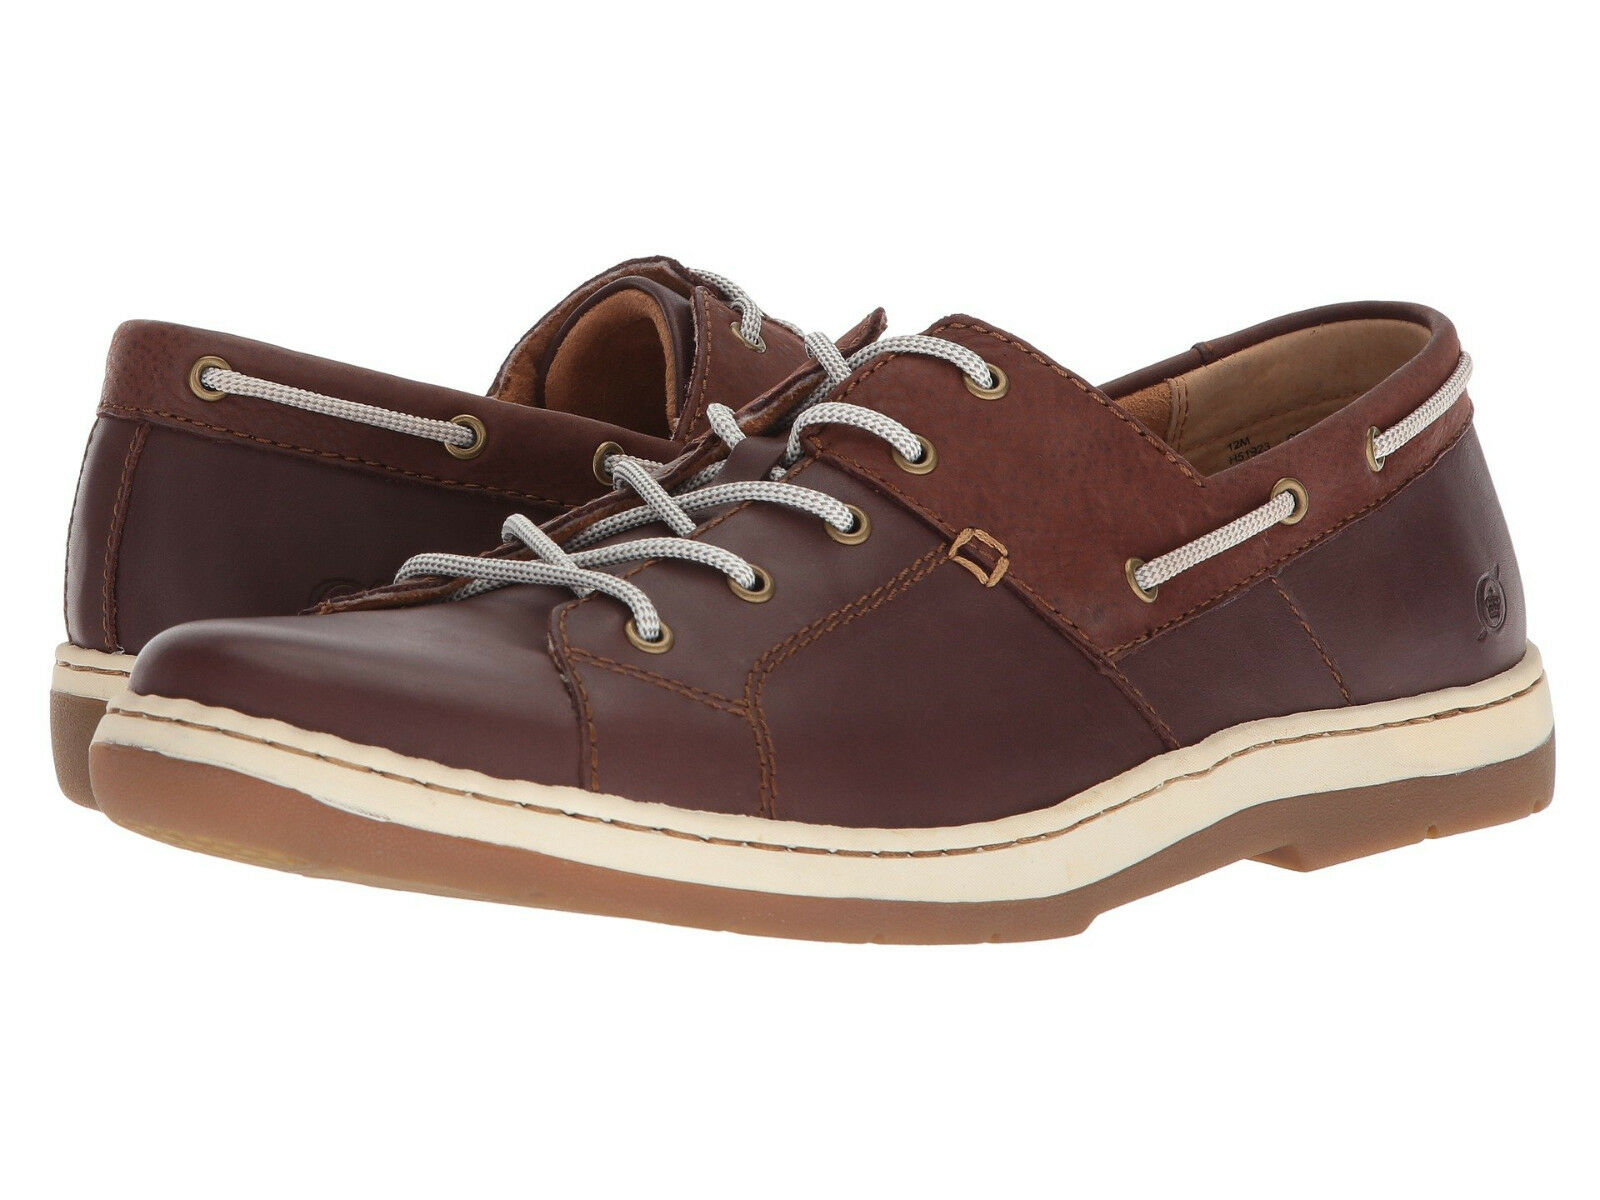 Born Mens Marius Lace-Up  Nautical Boat Casual Sneakers shoes Opanka Kicks